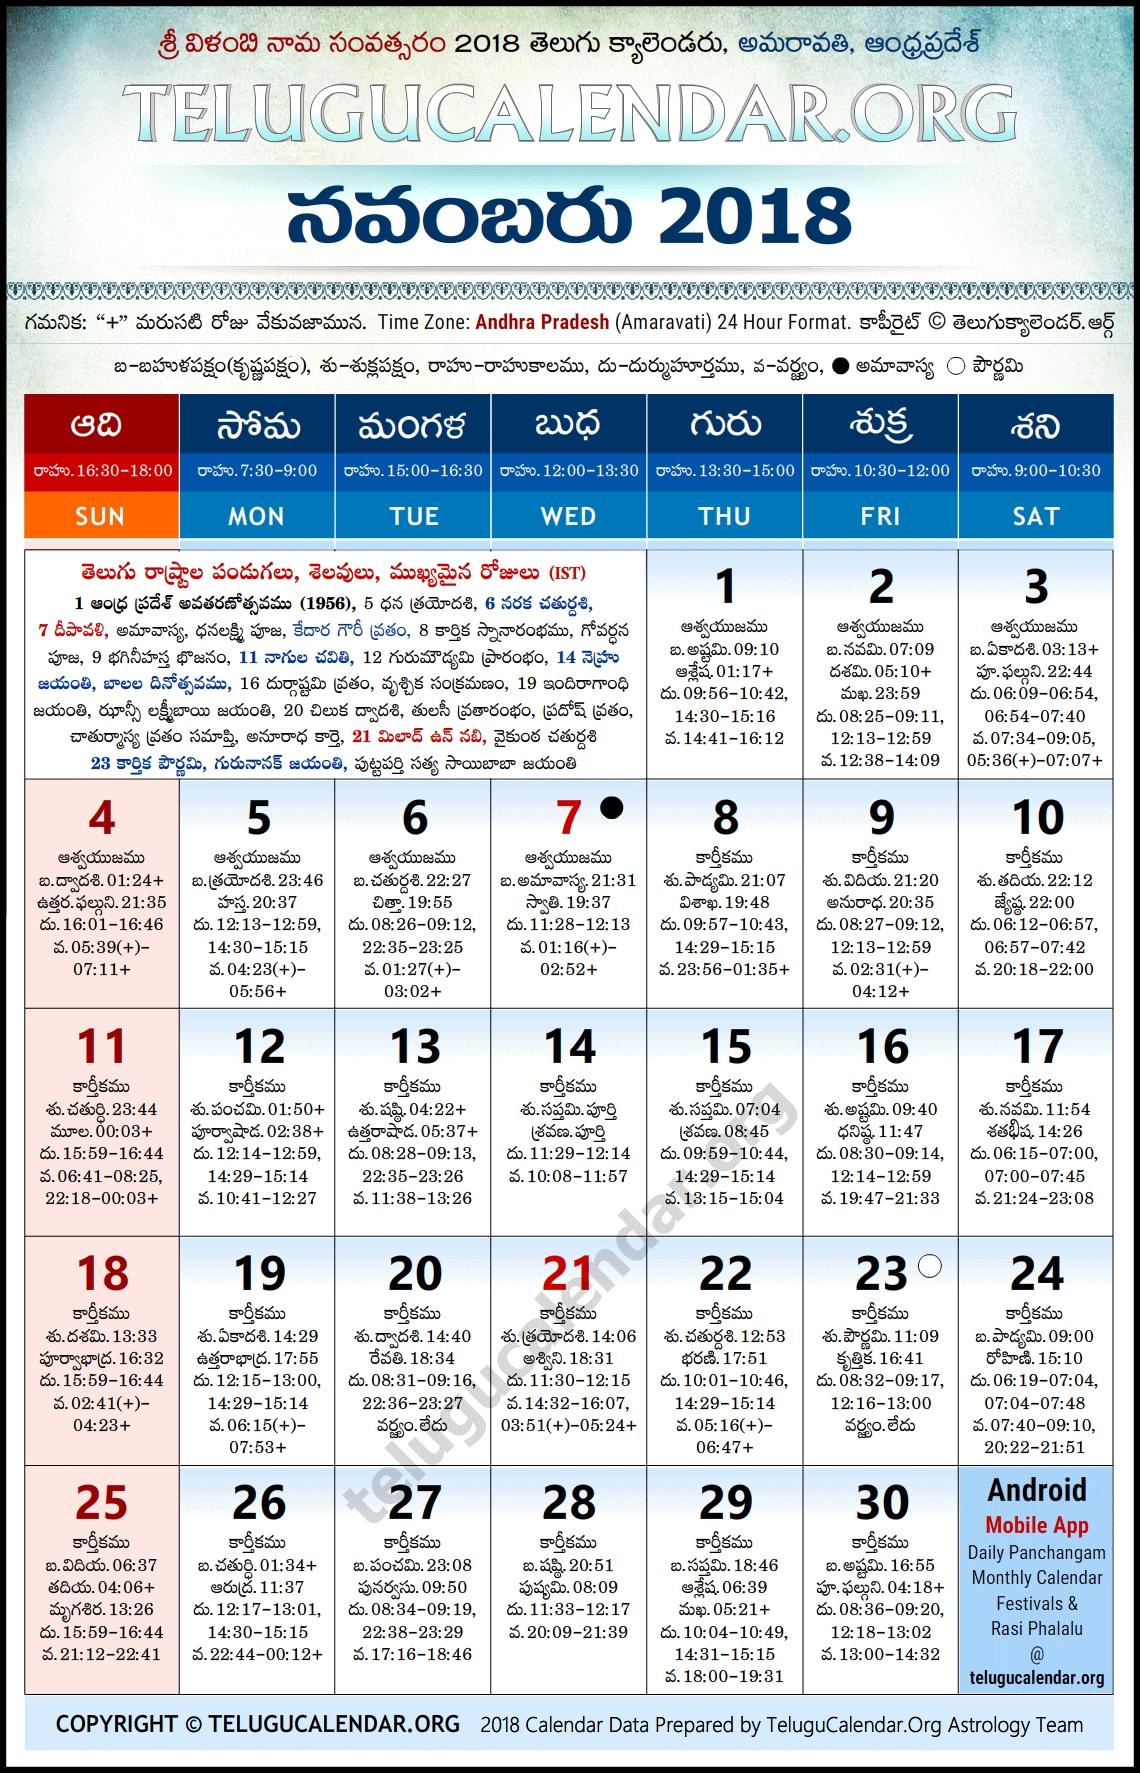 Andhra Pradesh | 2018 November Telugu Calendar High Resolution